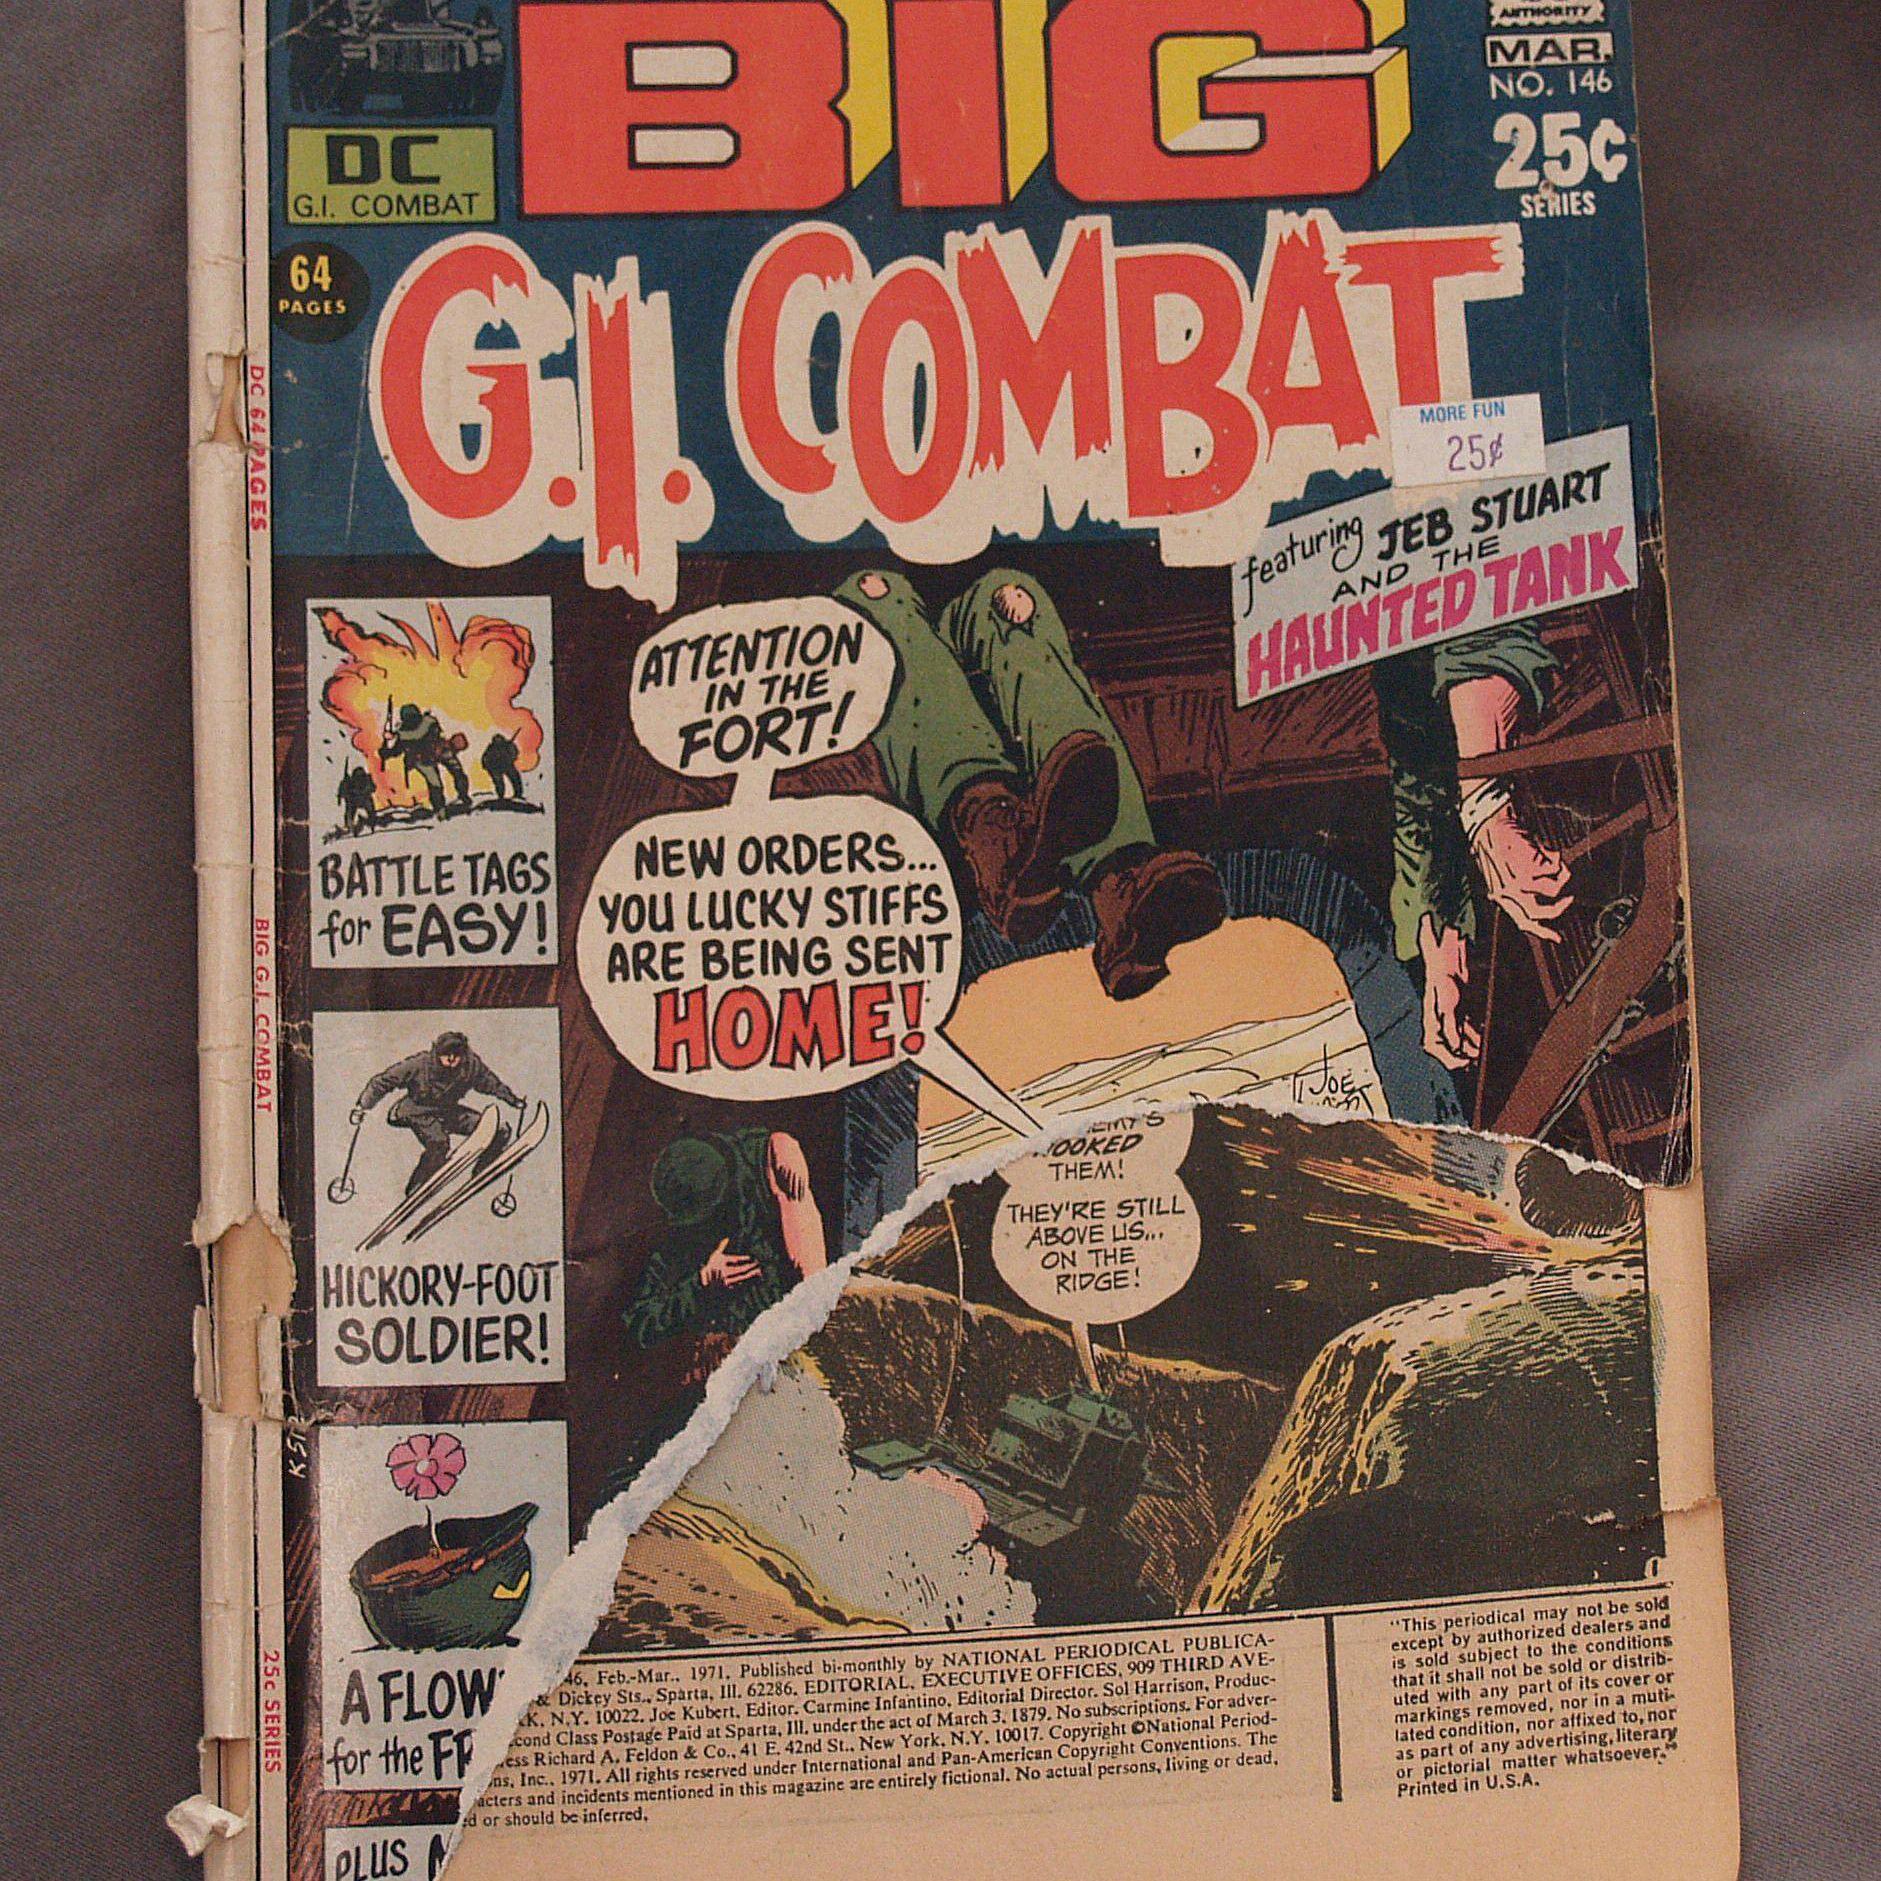 Vintage comic book